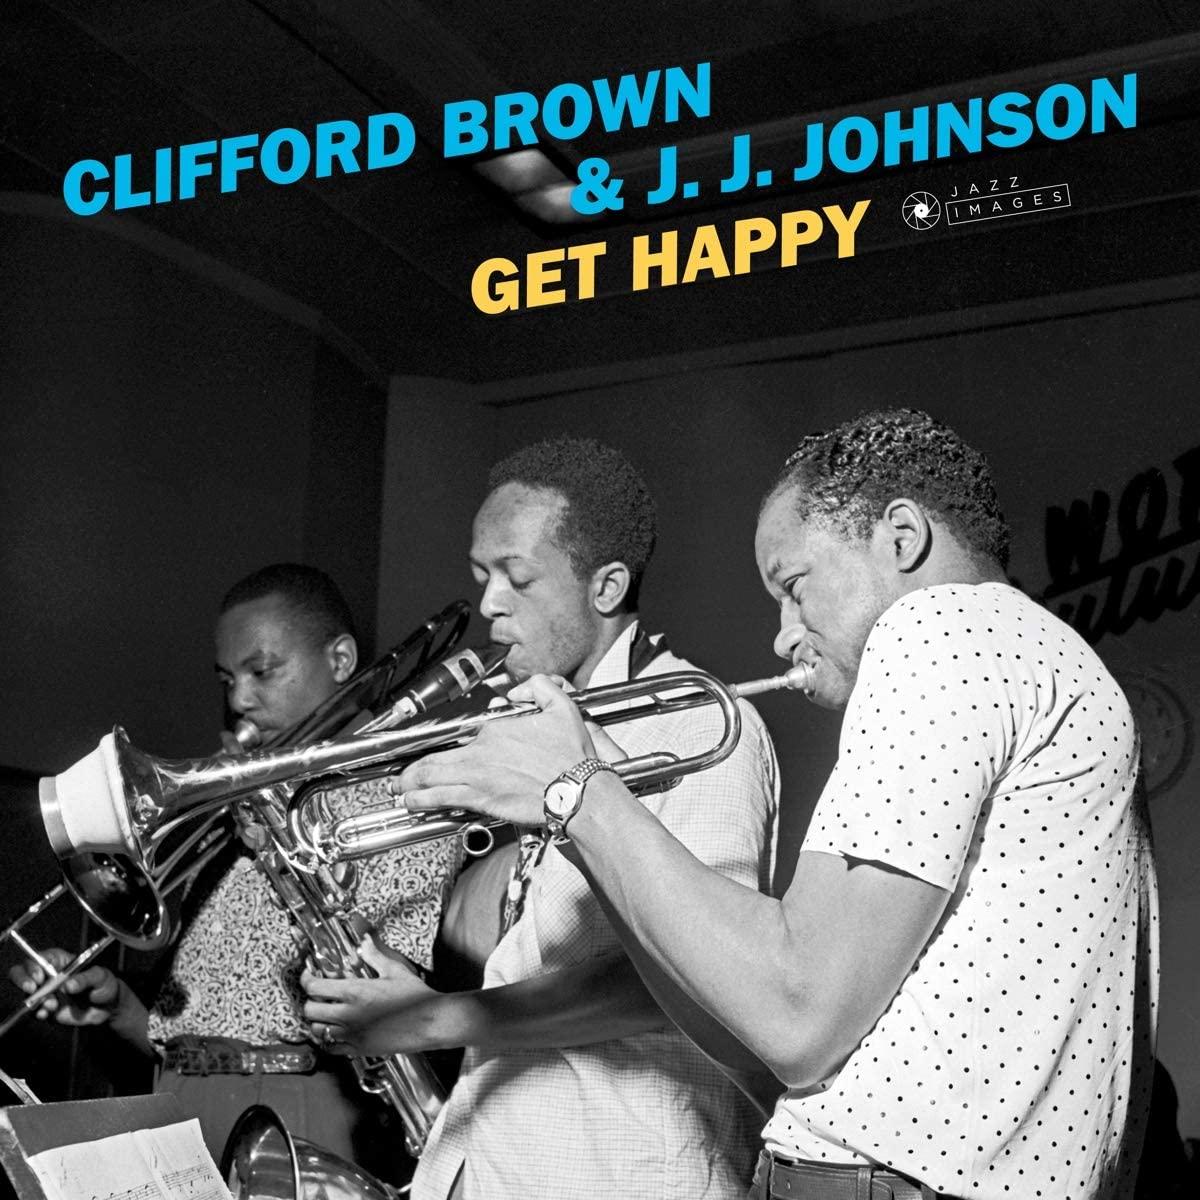 CLIFFORD BROWN / J.J. JOHNSON - GET HAPPY (LP)